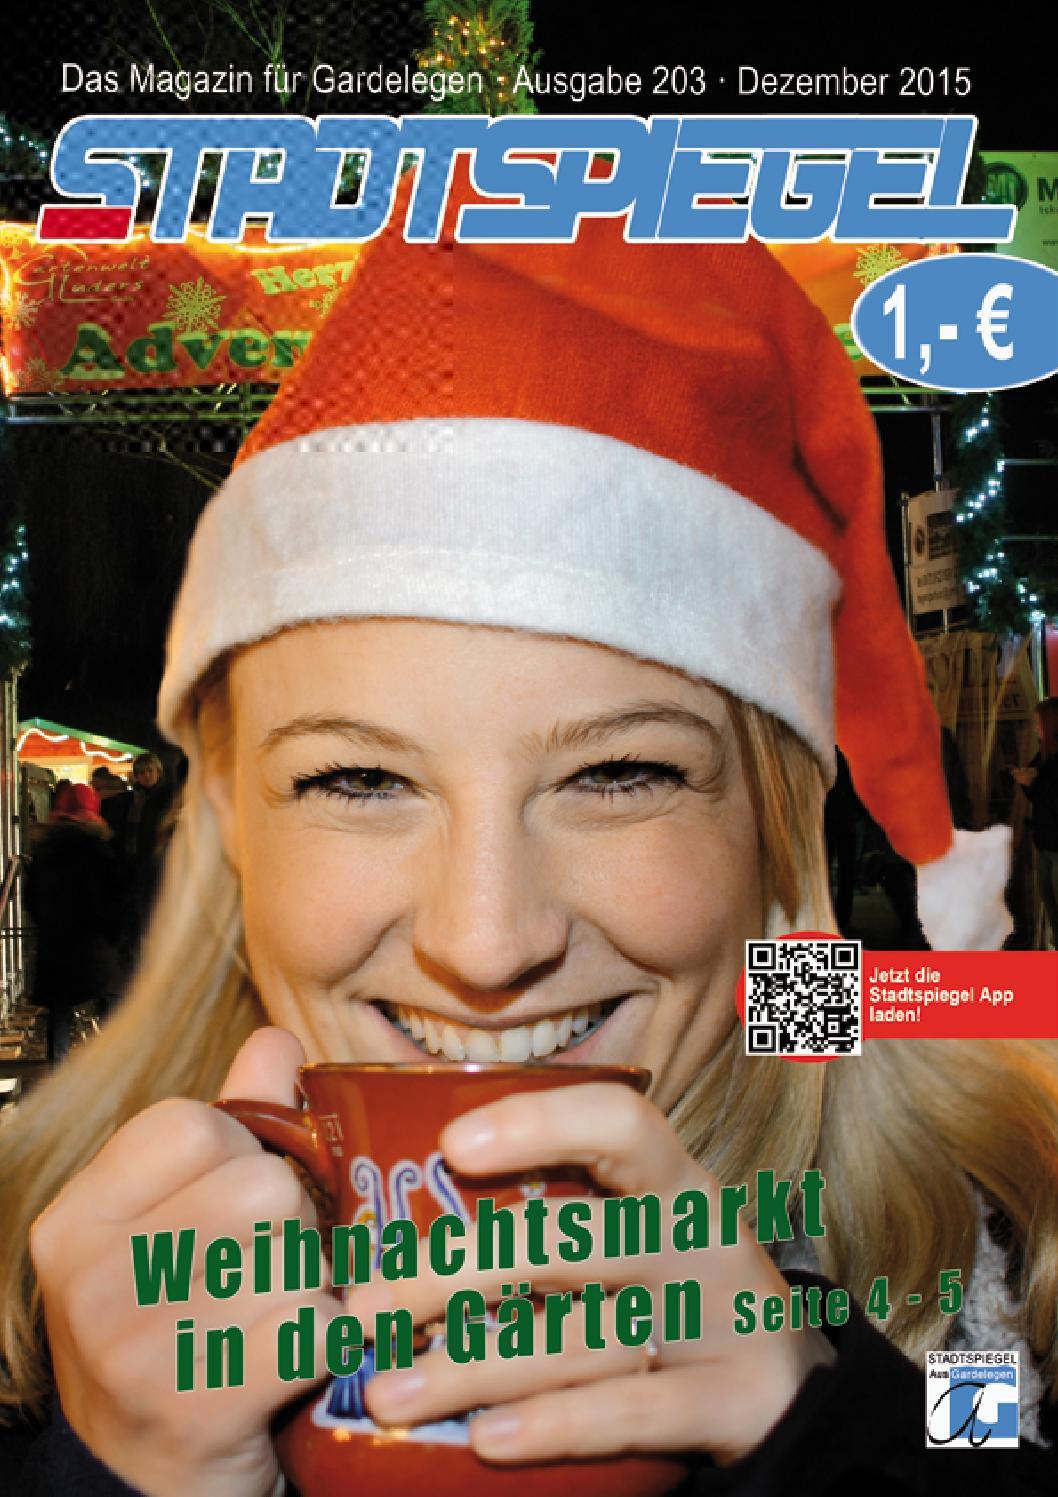 Stadtspiegel Gardelegen Dezember 2015 by Jana Friedrich - issuu